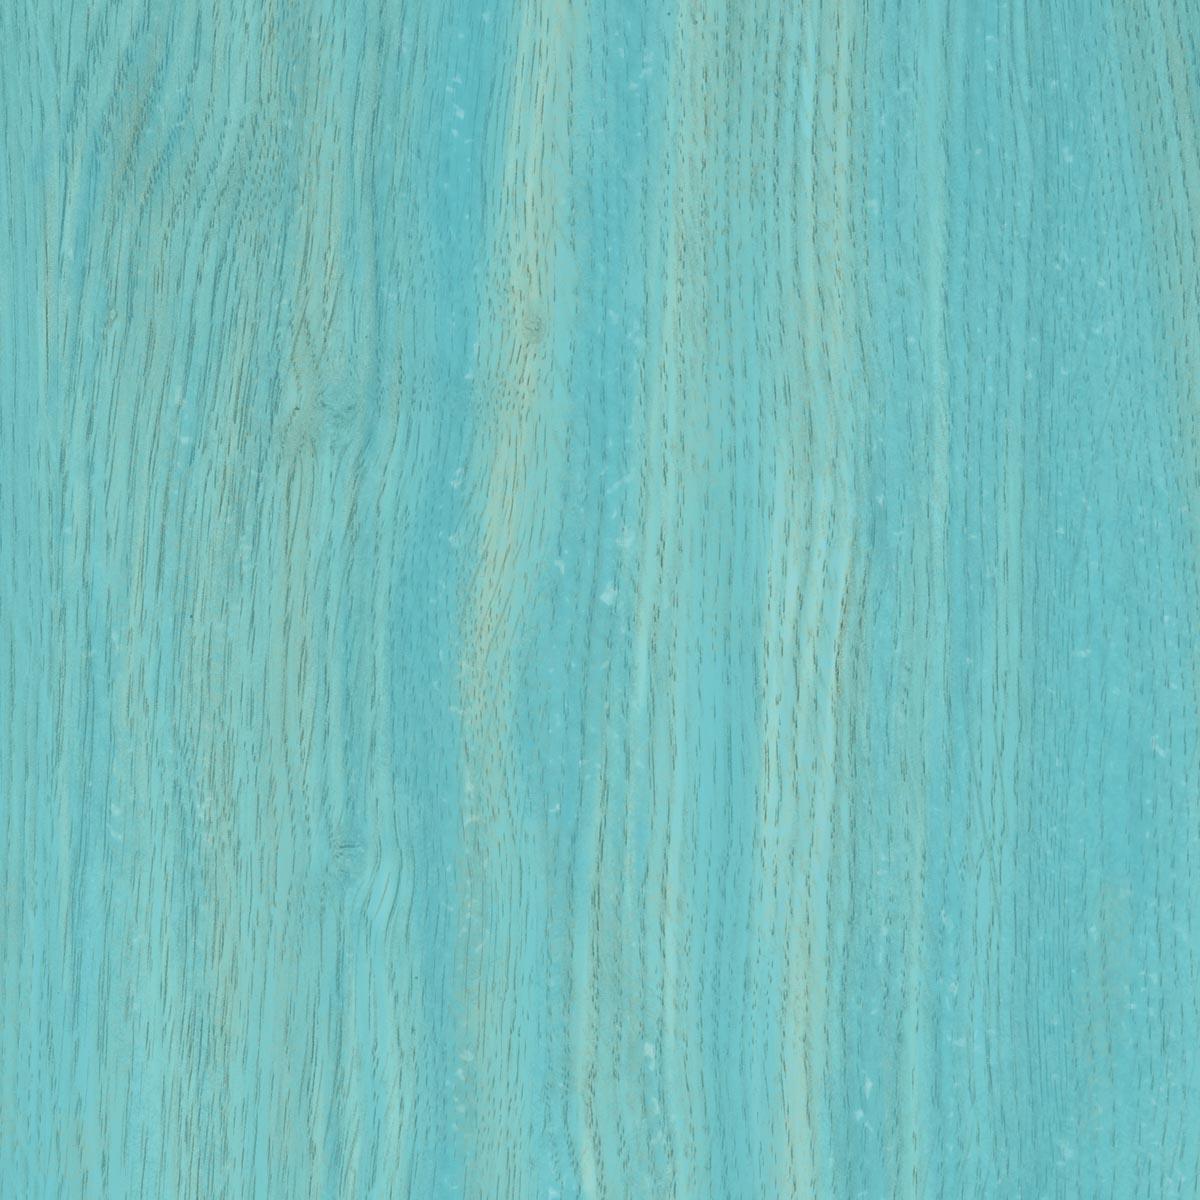 FolkArt ® Pickling Wash™ - Papillon, 2 oz. - 5821